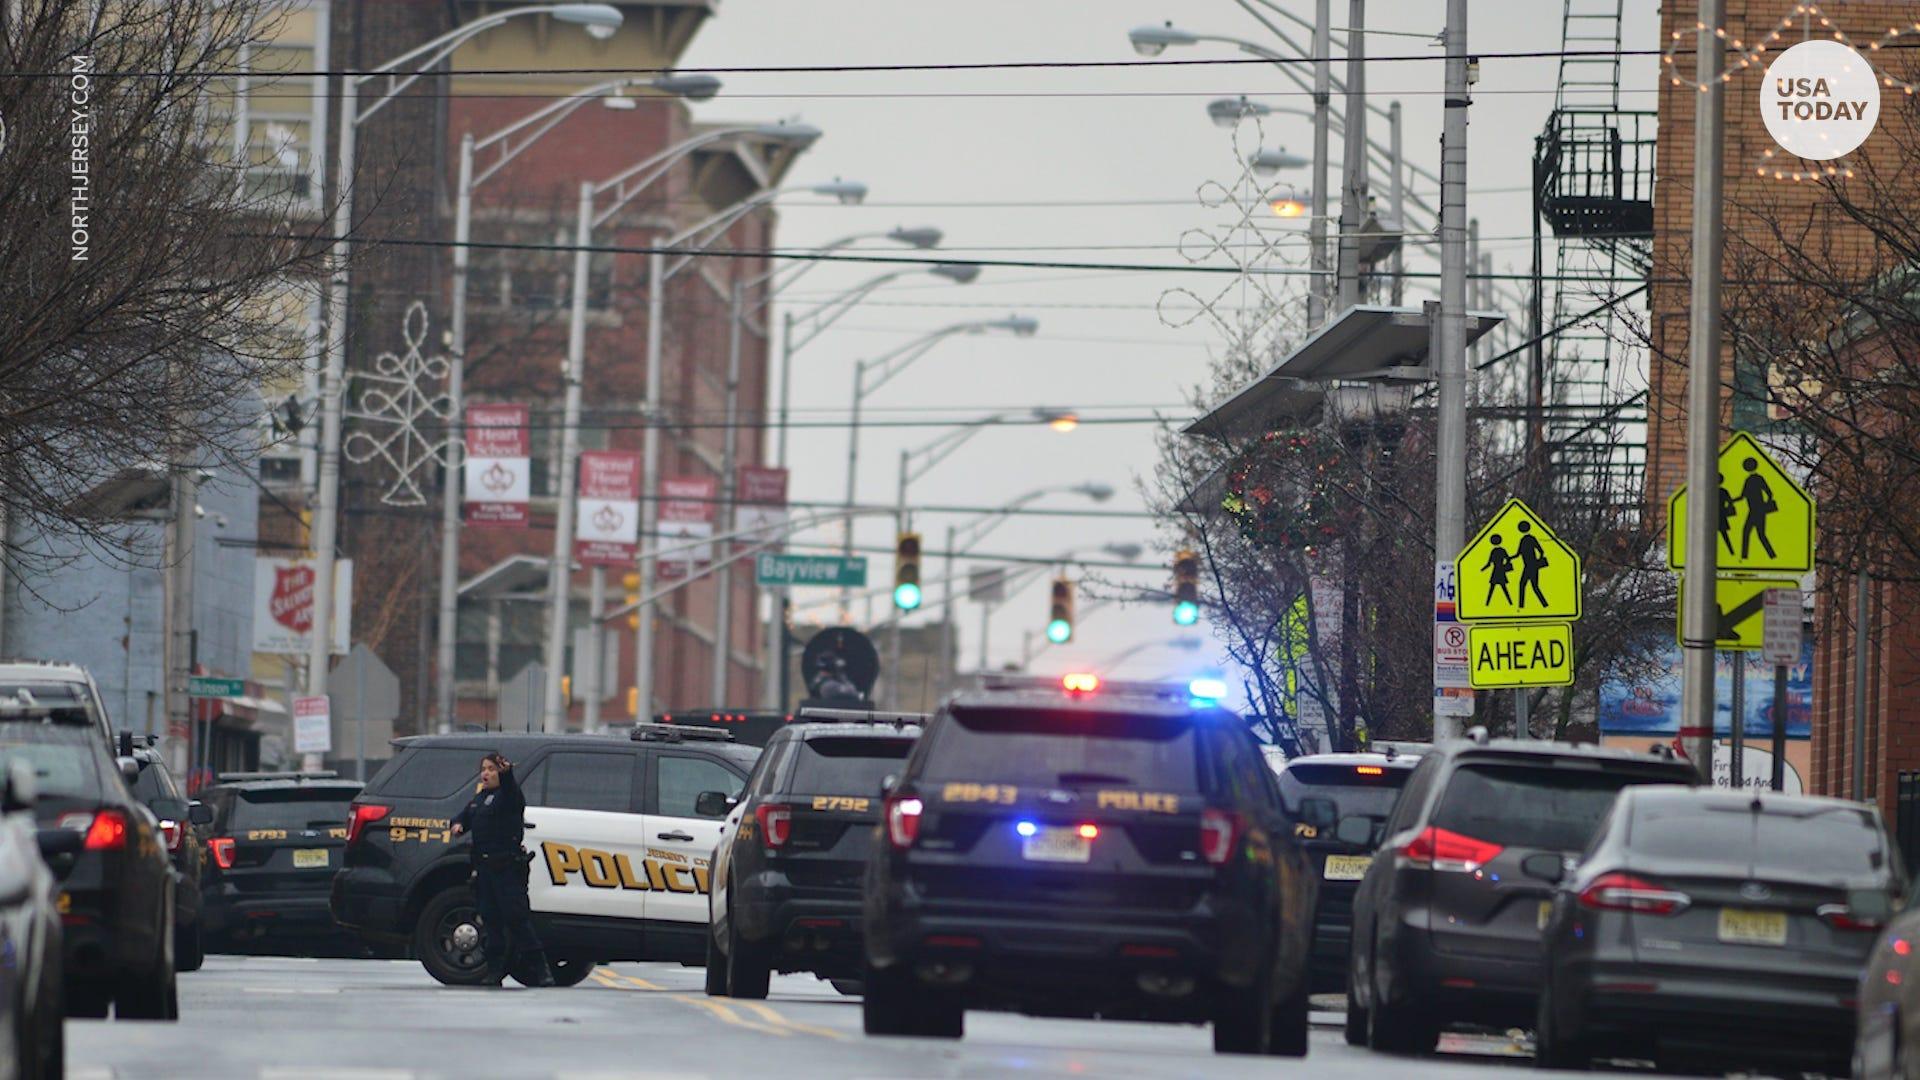 Jersey City shooting: Joseph Seals